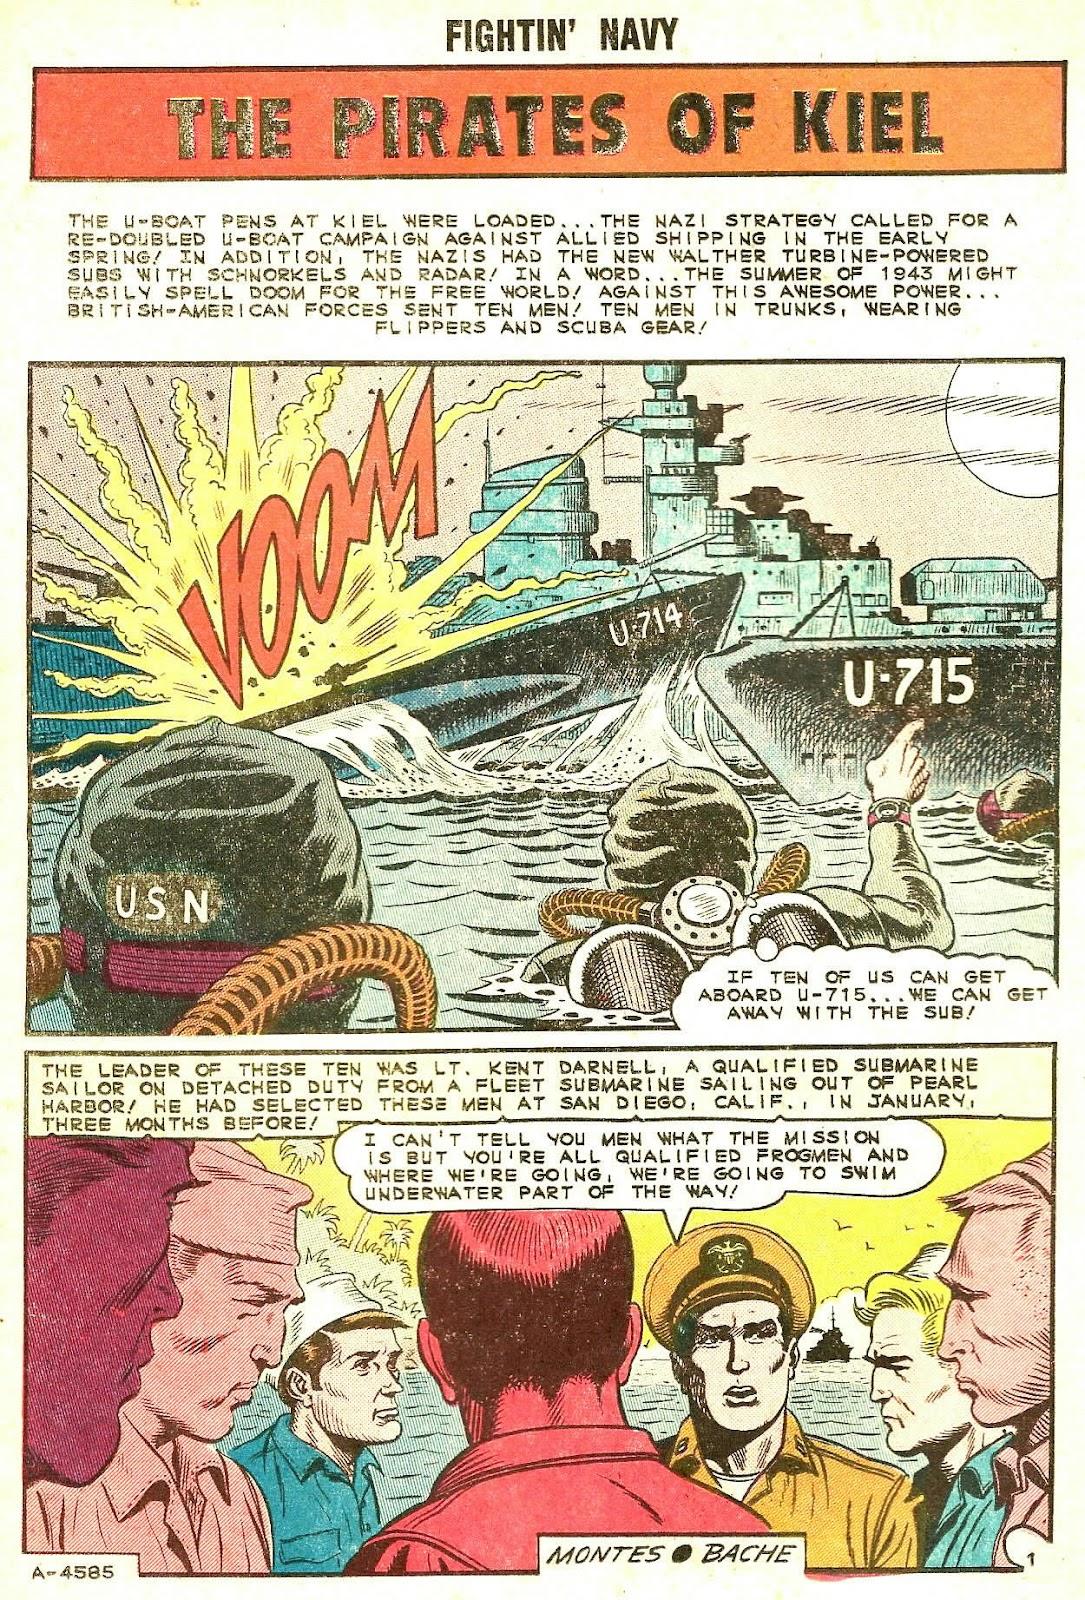 Read online Fightin' Navy comic -  Issue #120 - 26